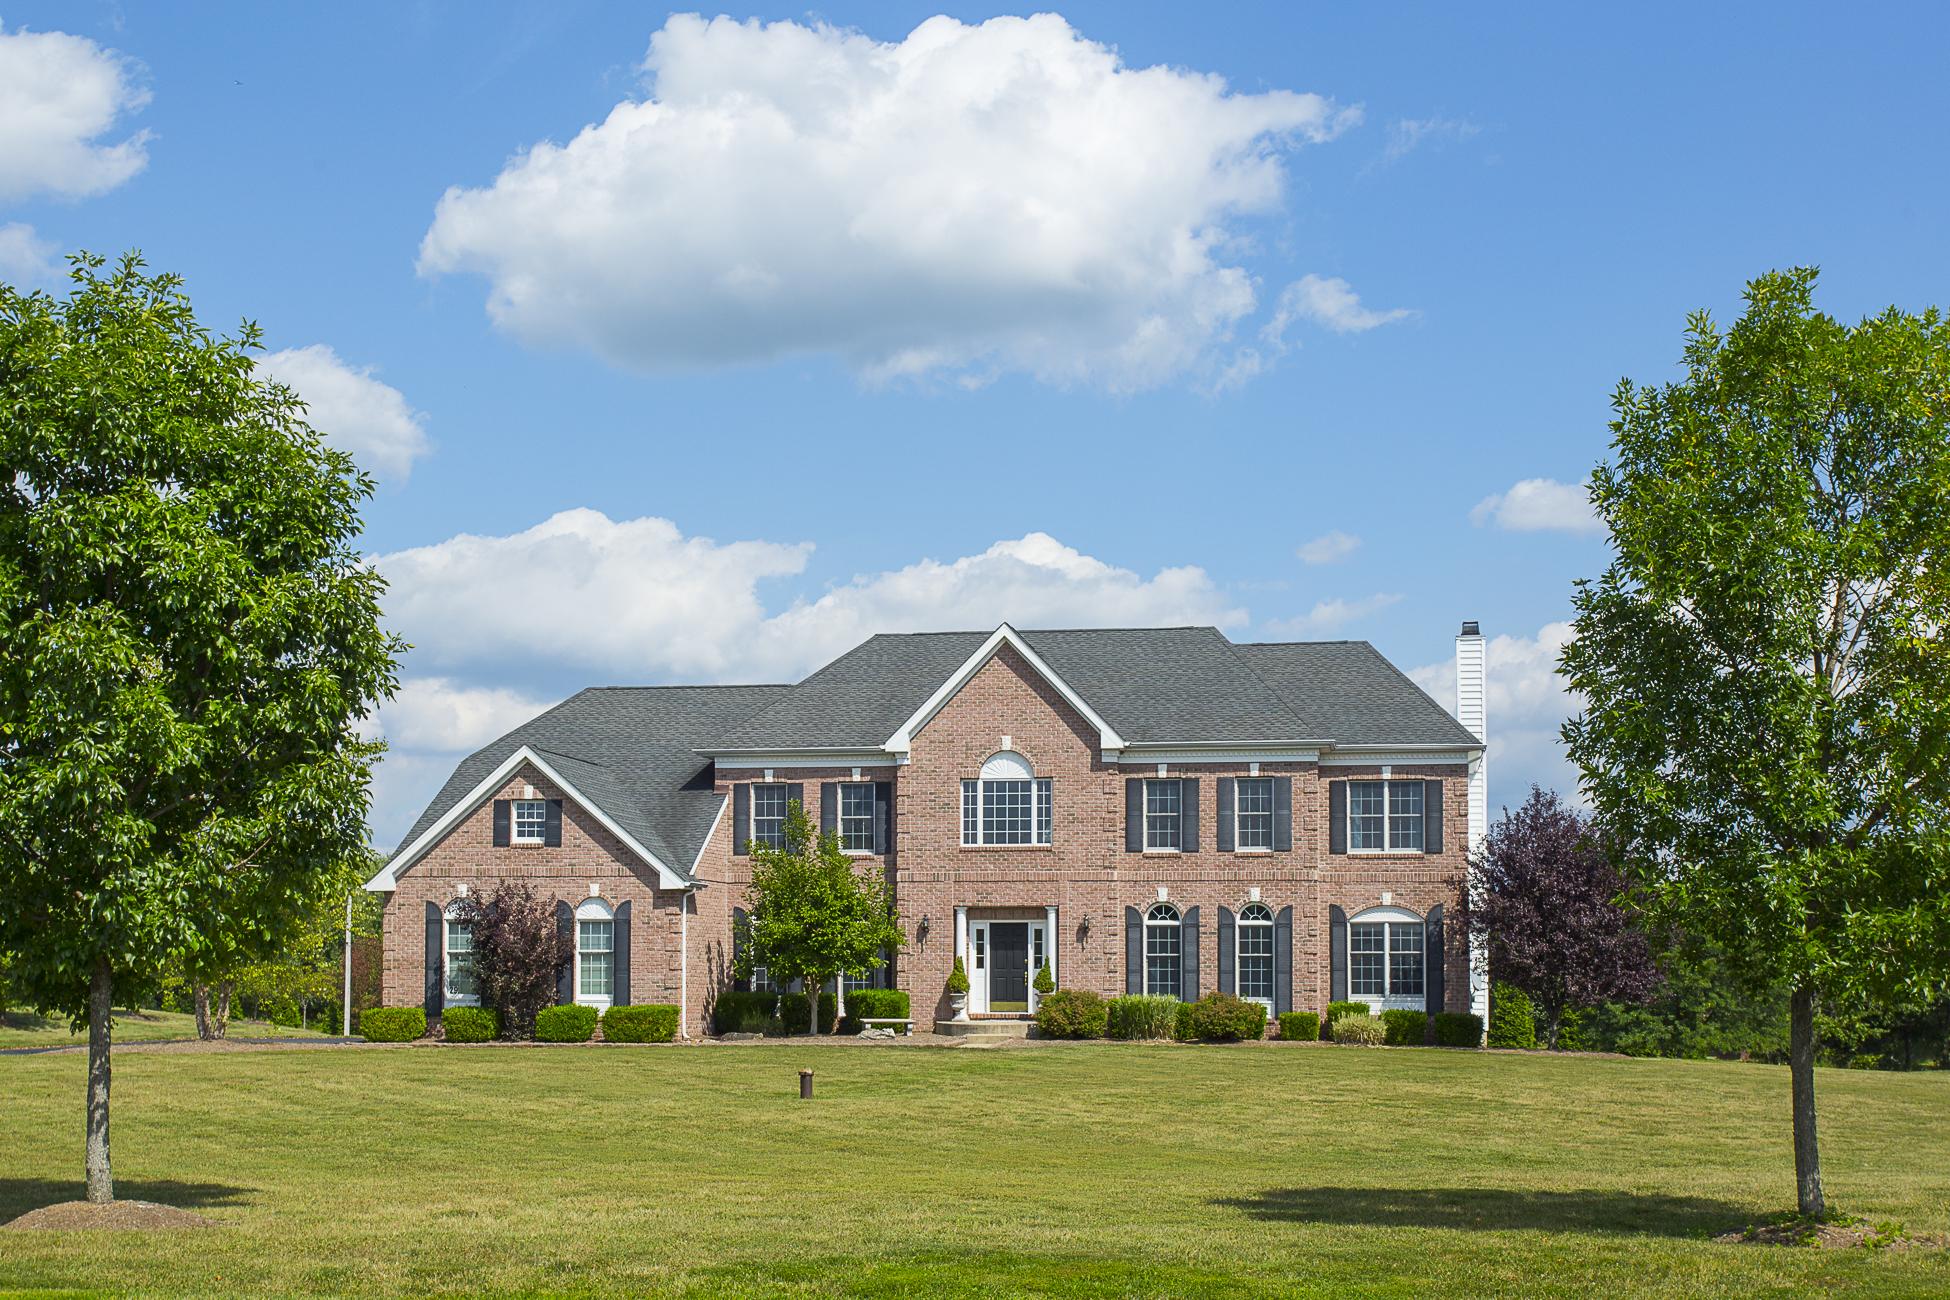 独户住宅 为 销售 在 Classic Space In Serene Setting - Hopewell Township 29 Hallett Drive Pennington, 新泽西州 08534 美国